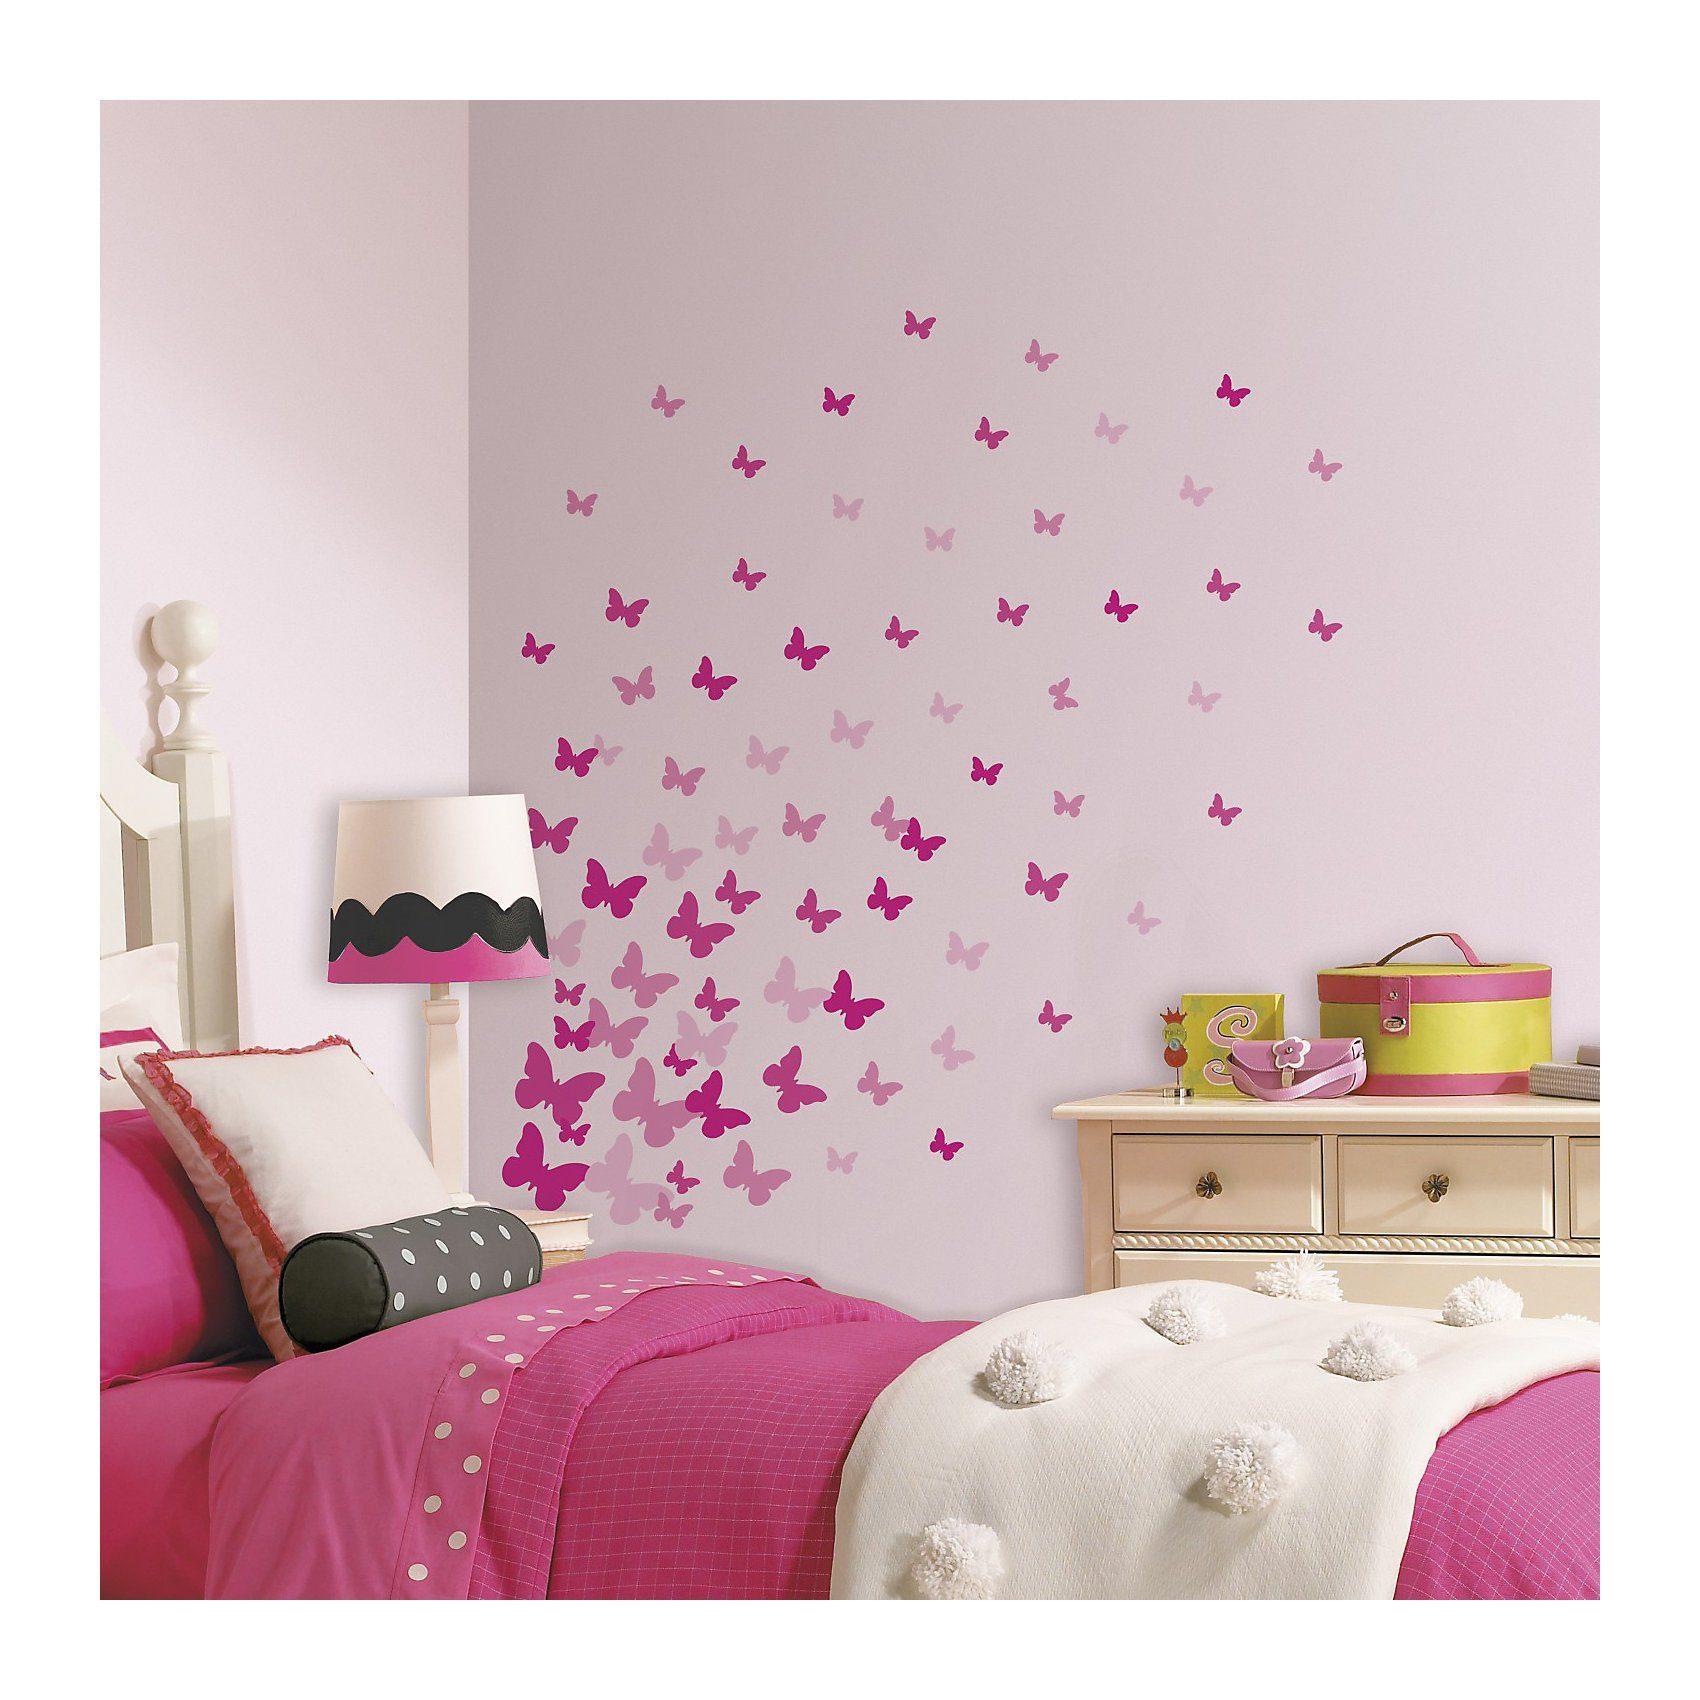 RoomMates Wandsticker Schmetterlinge, 75-tlg.